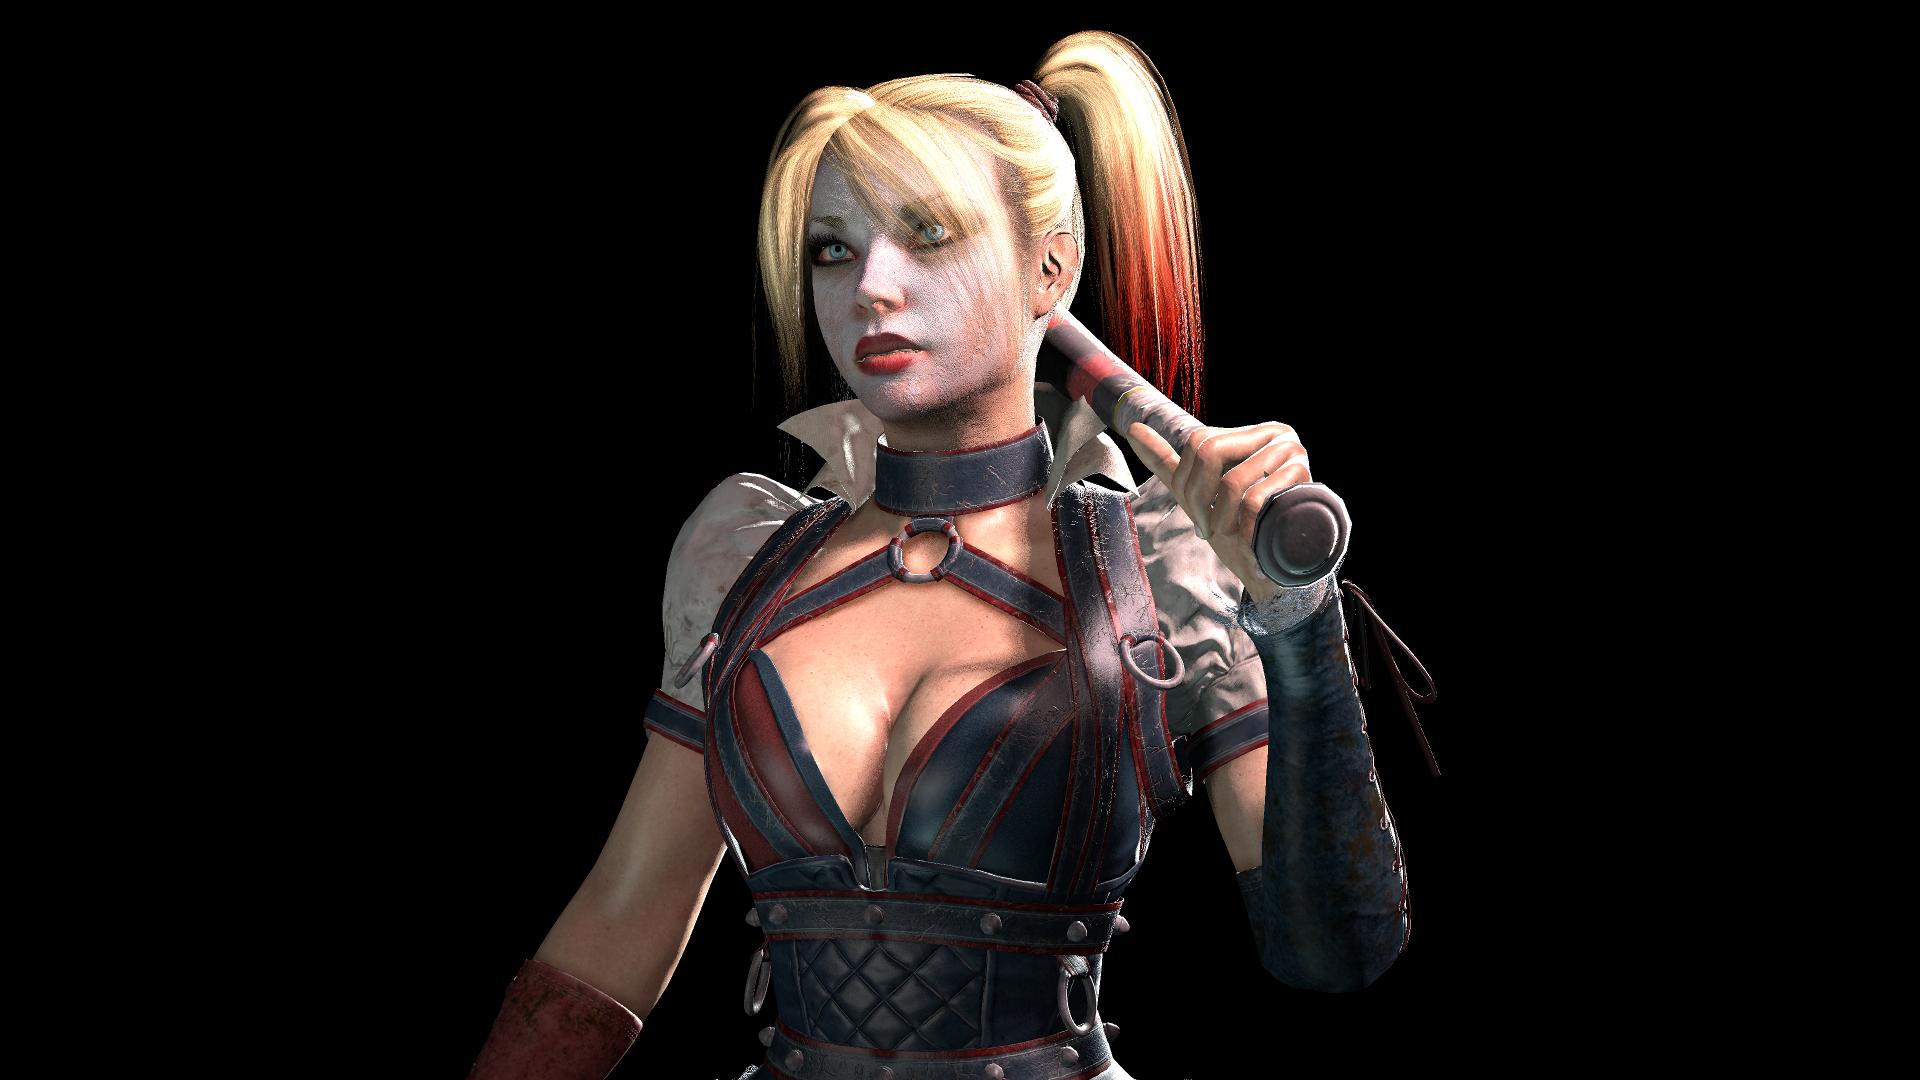 Steam Workshop Batman Arkham Knight Harley Quinn